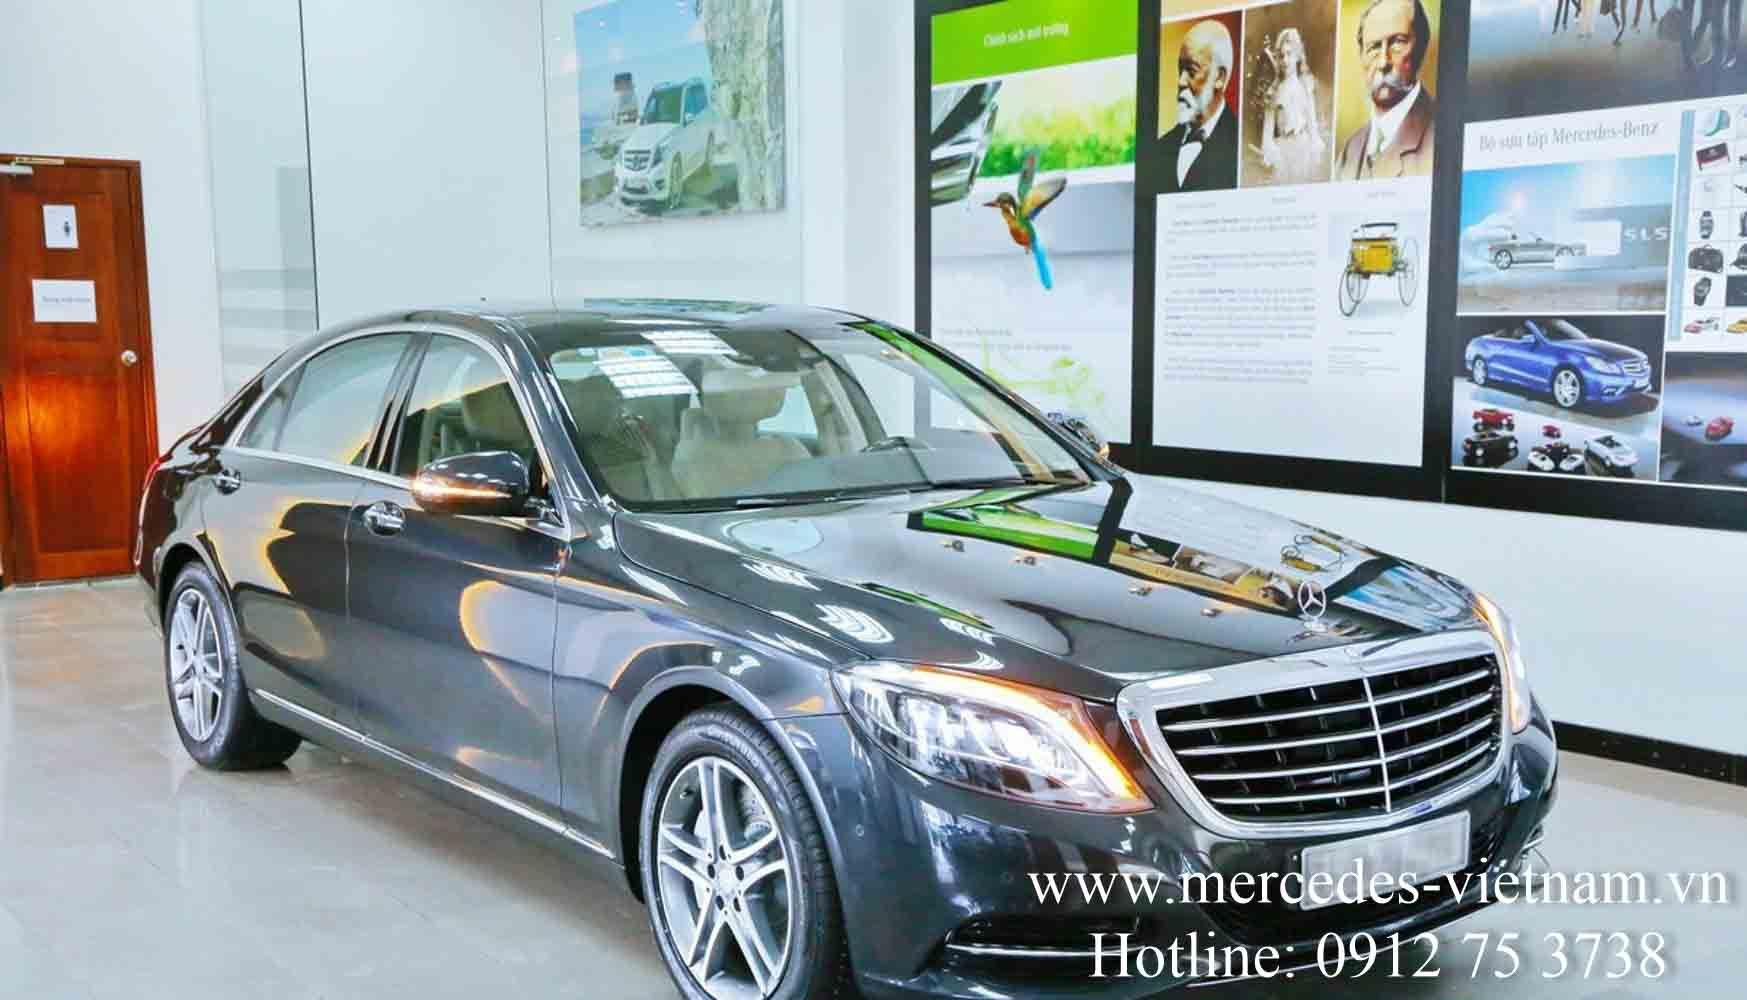 Giá xe Mercedes S400 L tốt nhất - LH: 0938 898 282